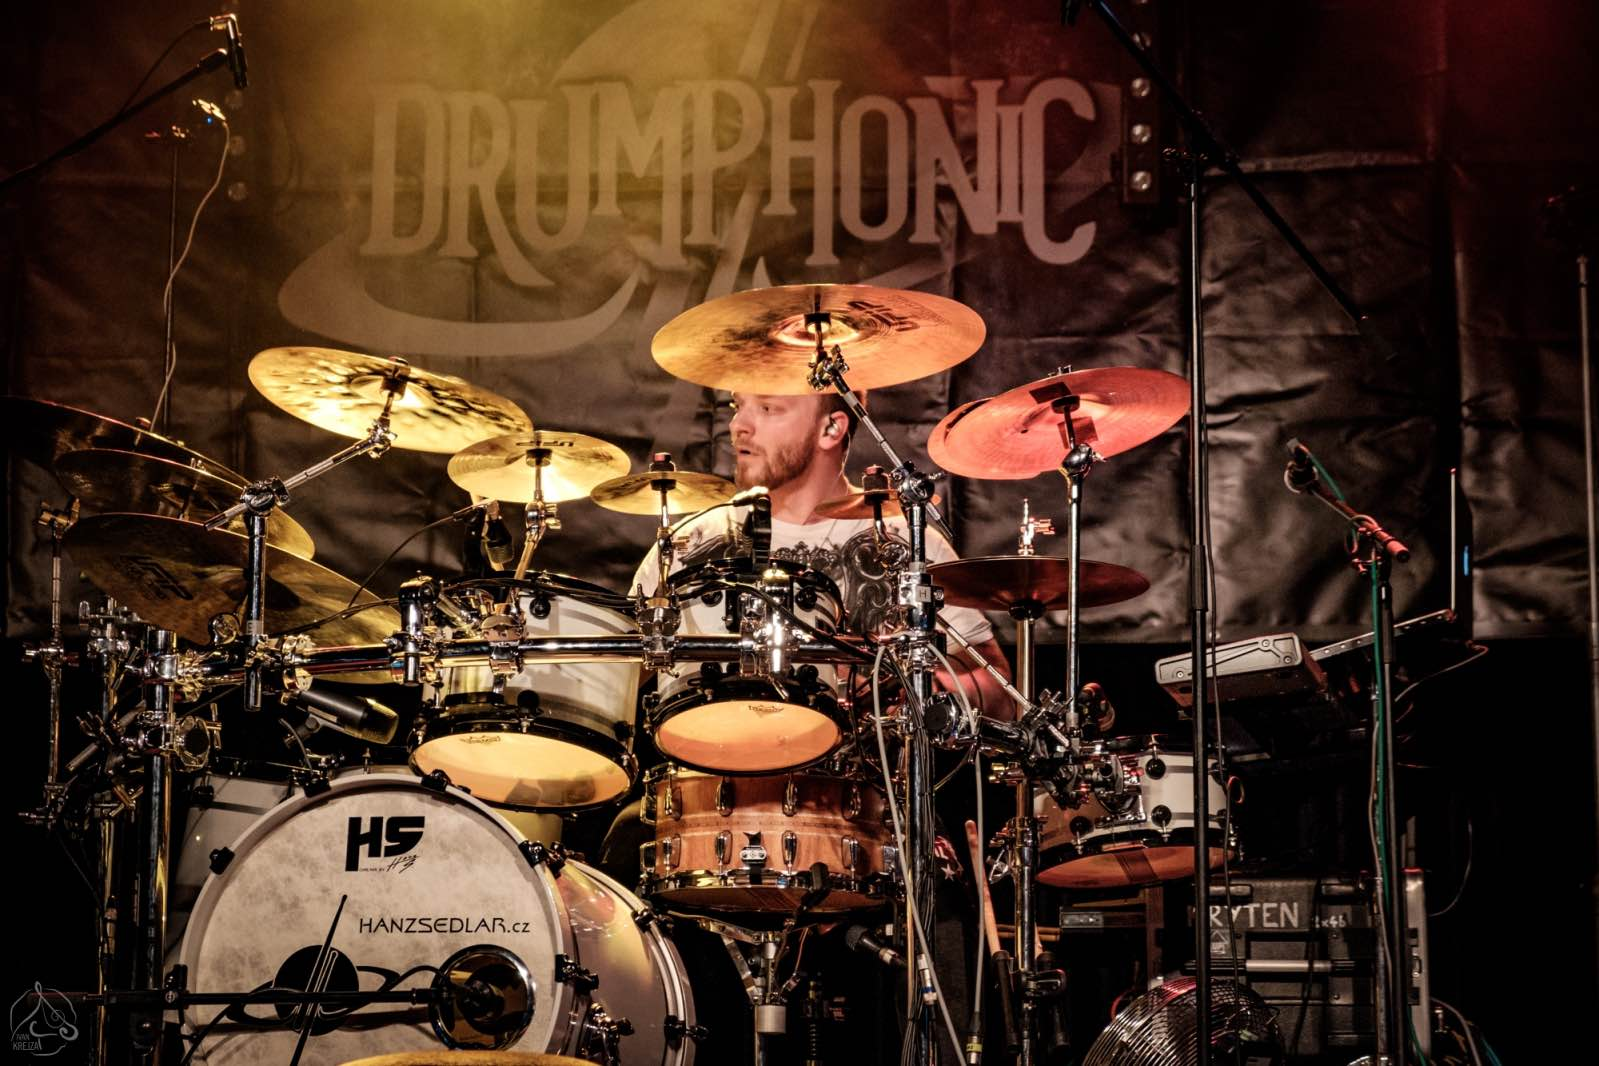 Drumphonic